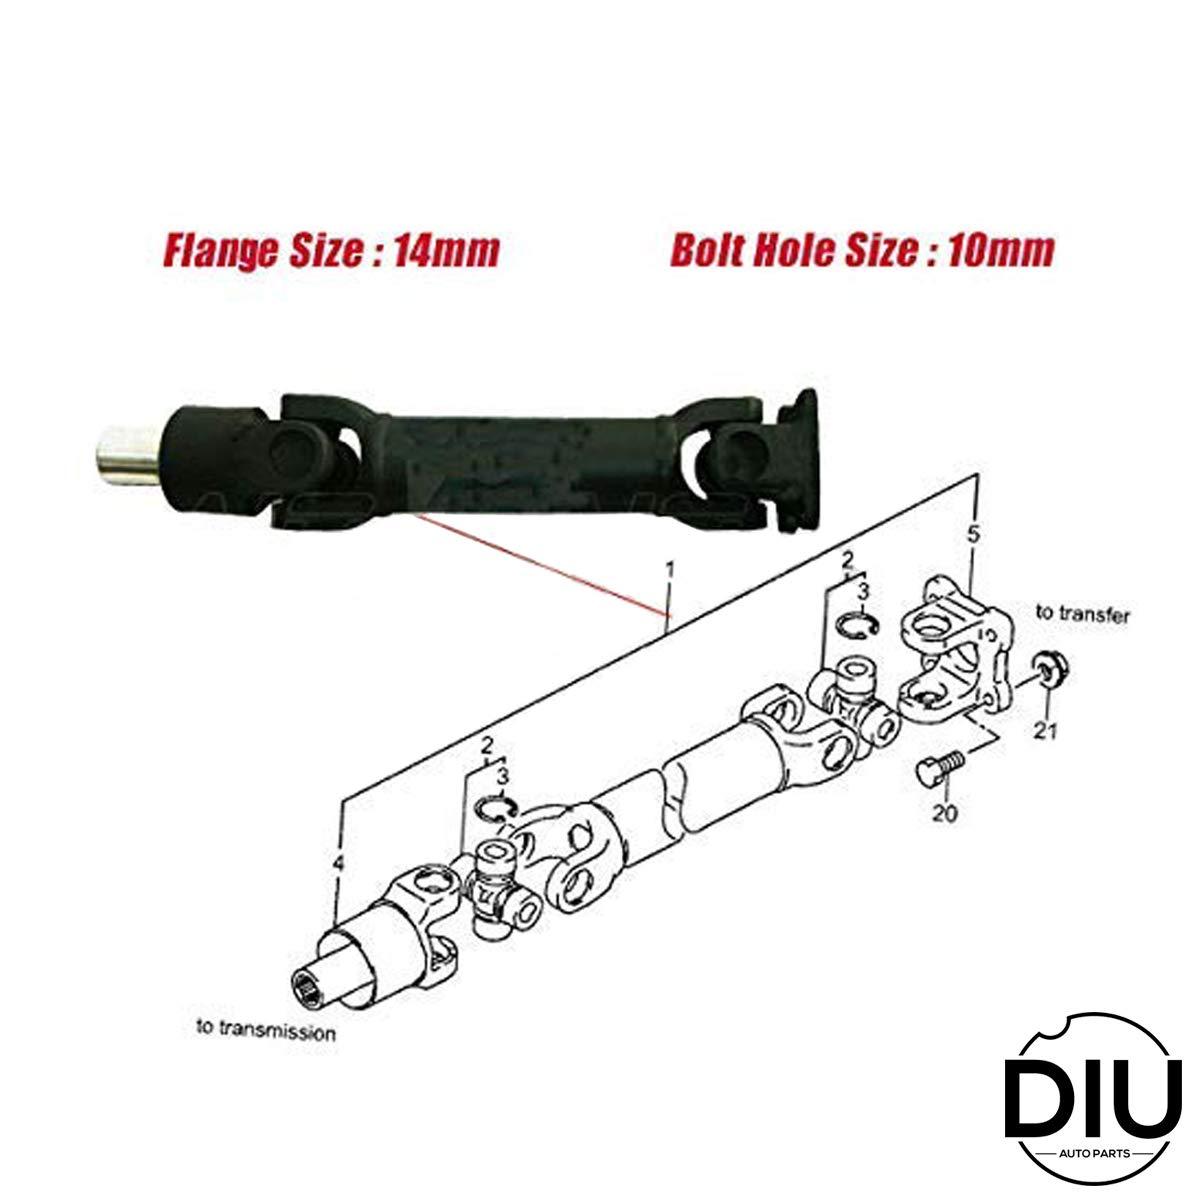 Samurai SJ410 SJ413 1986-1989 Drive Shaft Propeller Shaft Driveshaft Transmission Differential To Transfer Short Wheel Base W// 8mm Diameter Bolts